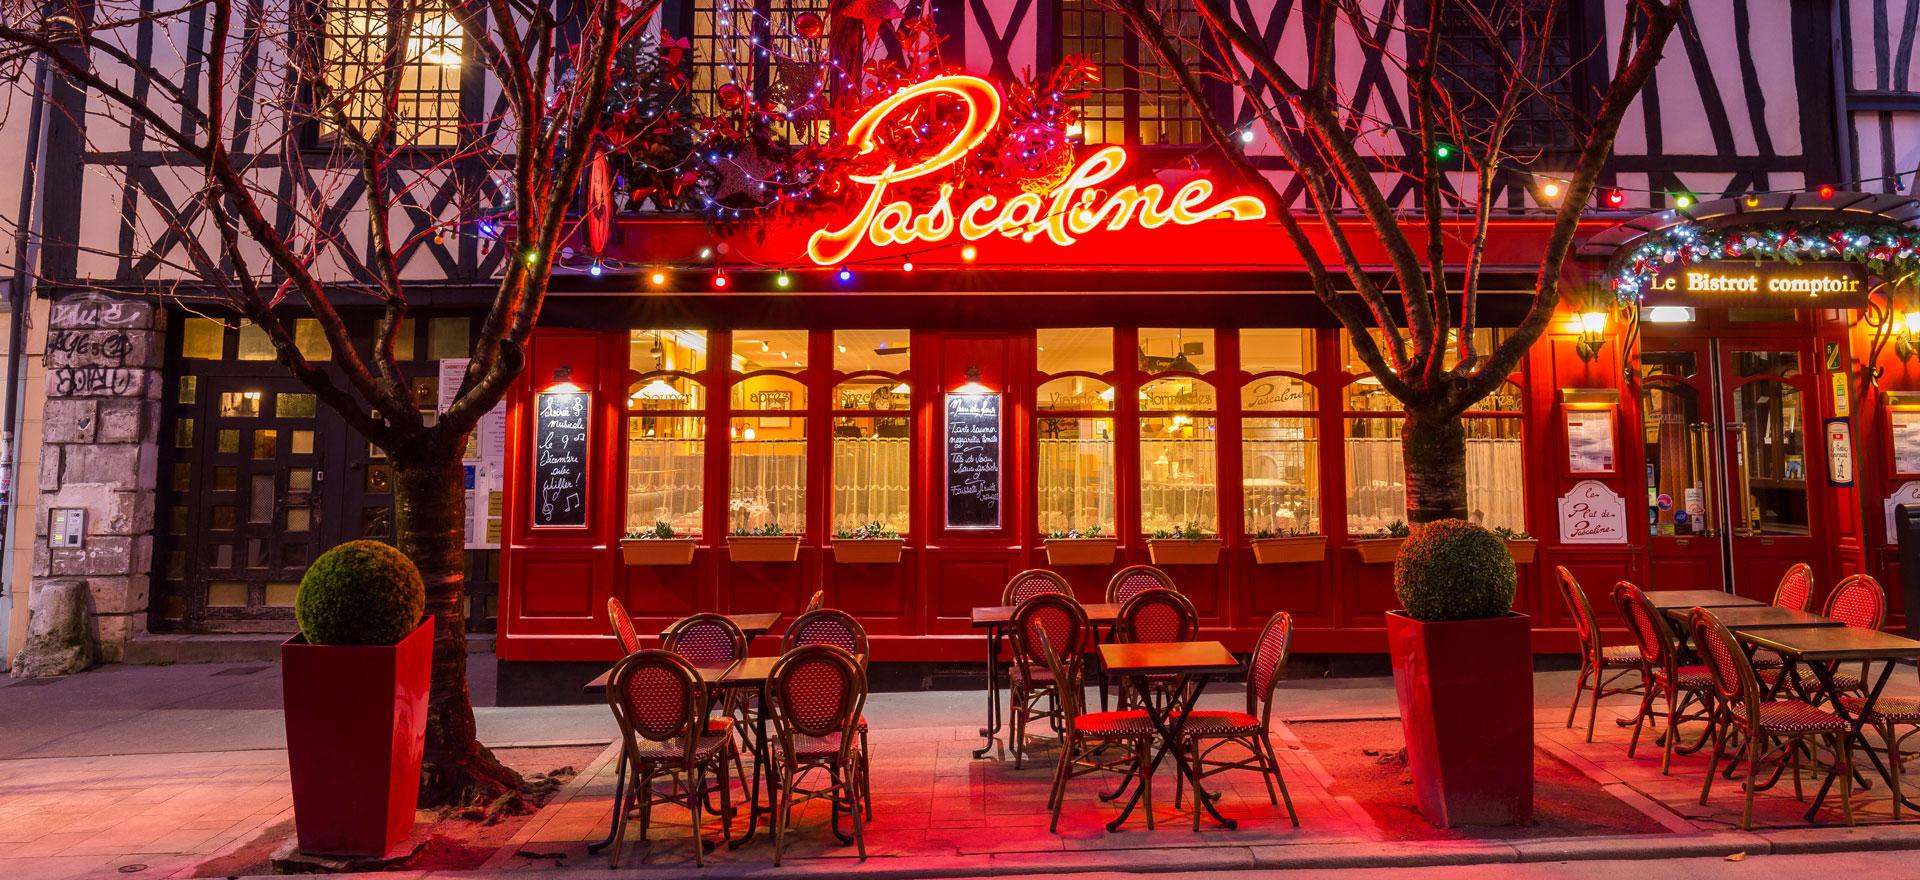 restaurant-pascaline-bistrot-comptoir-buffet-volonte-fait-maison-gueret-1880-rouen-1-facade-1920×880